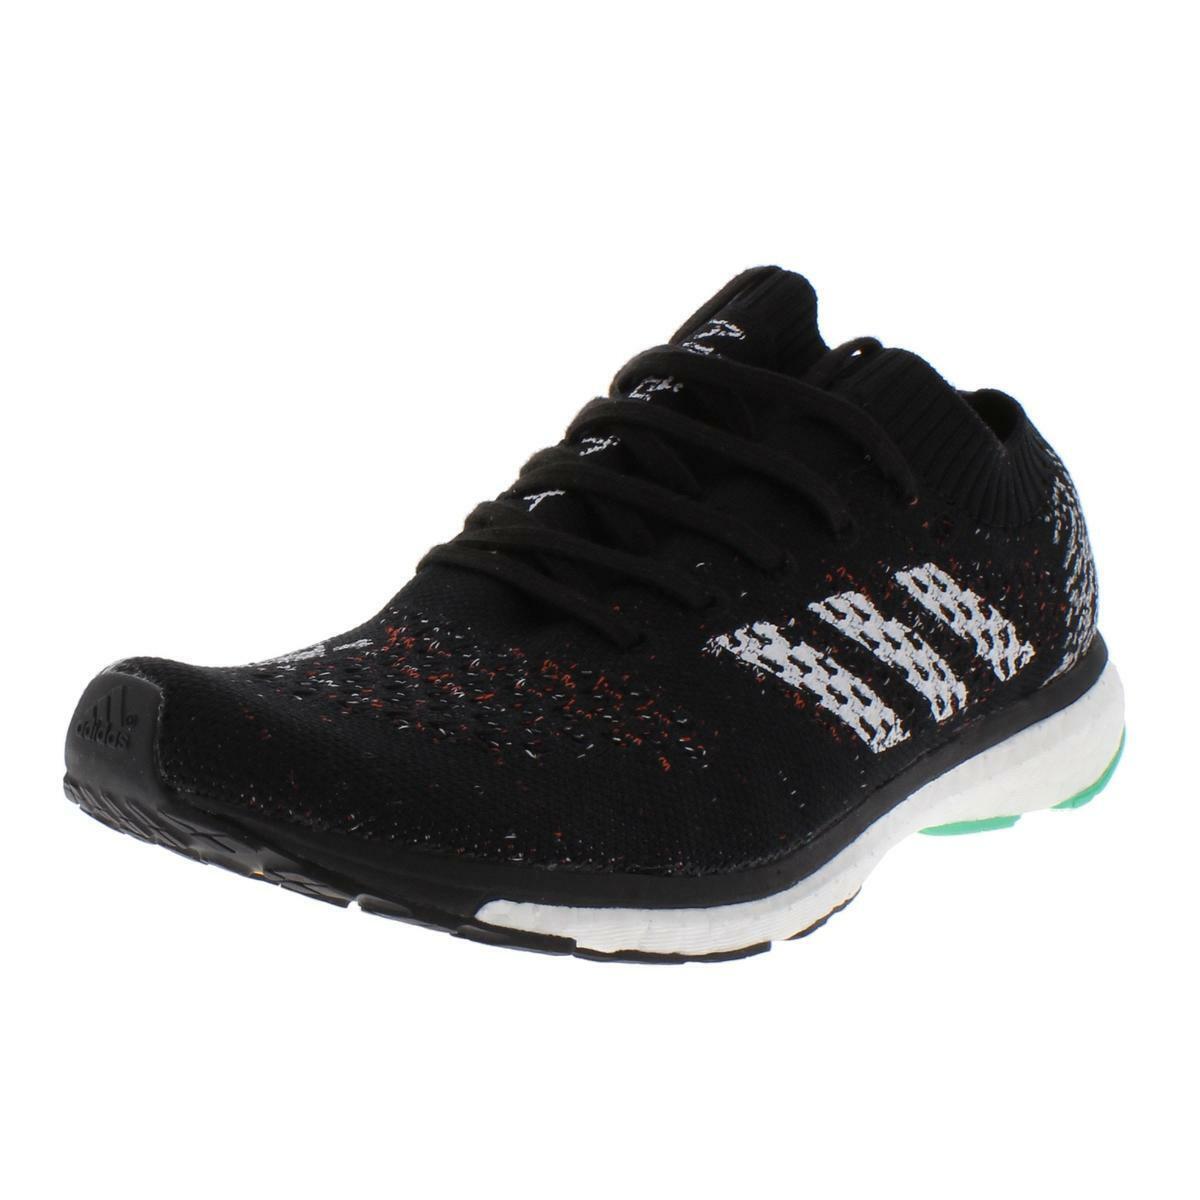 Adidas Para Hombre Adizero Prime LTD Correr Zapatos tenis atléticas de punto BHFO 6803